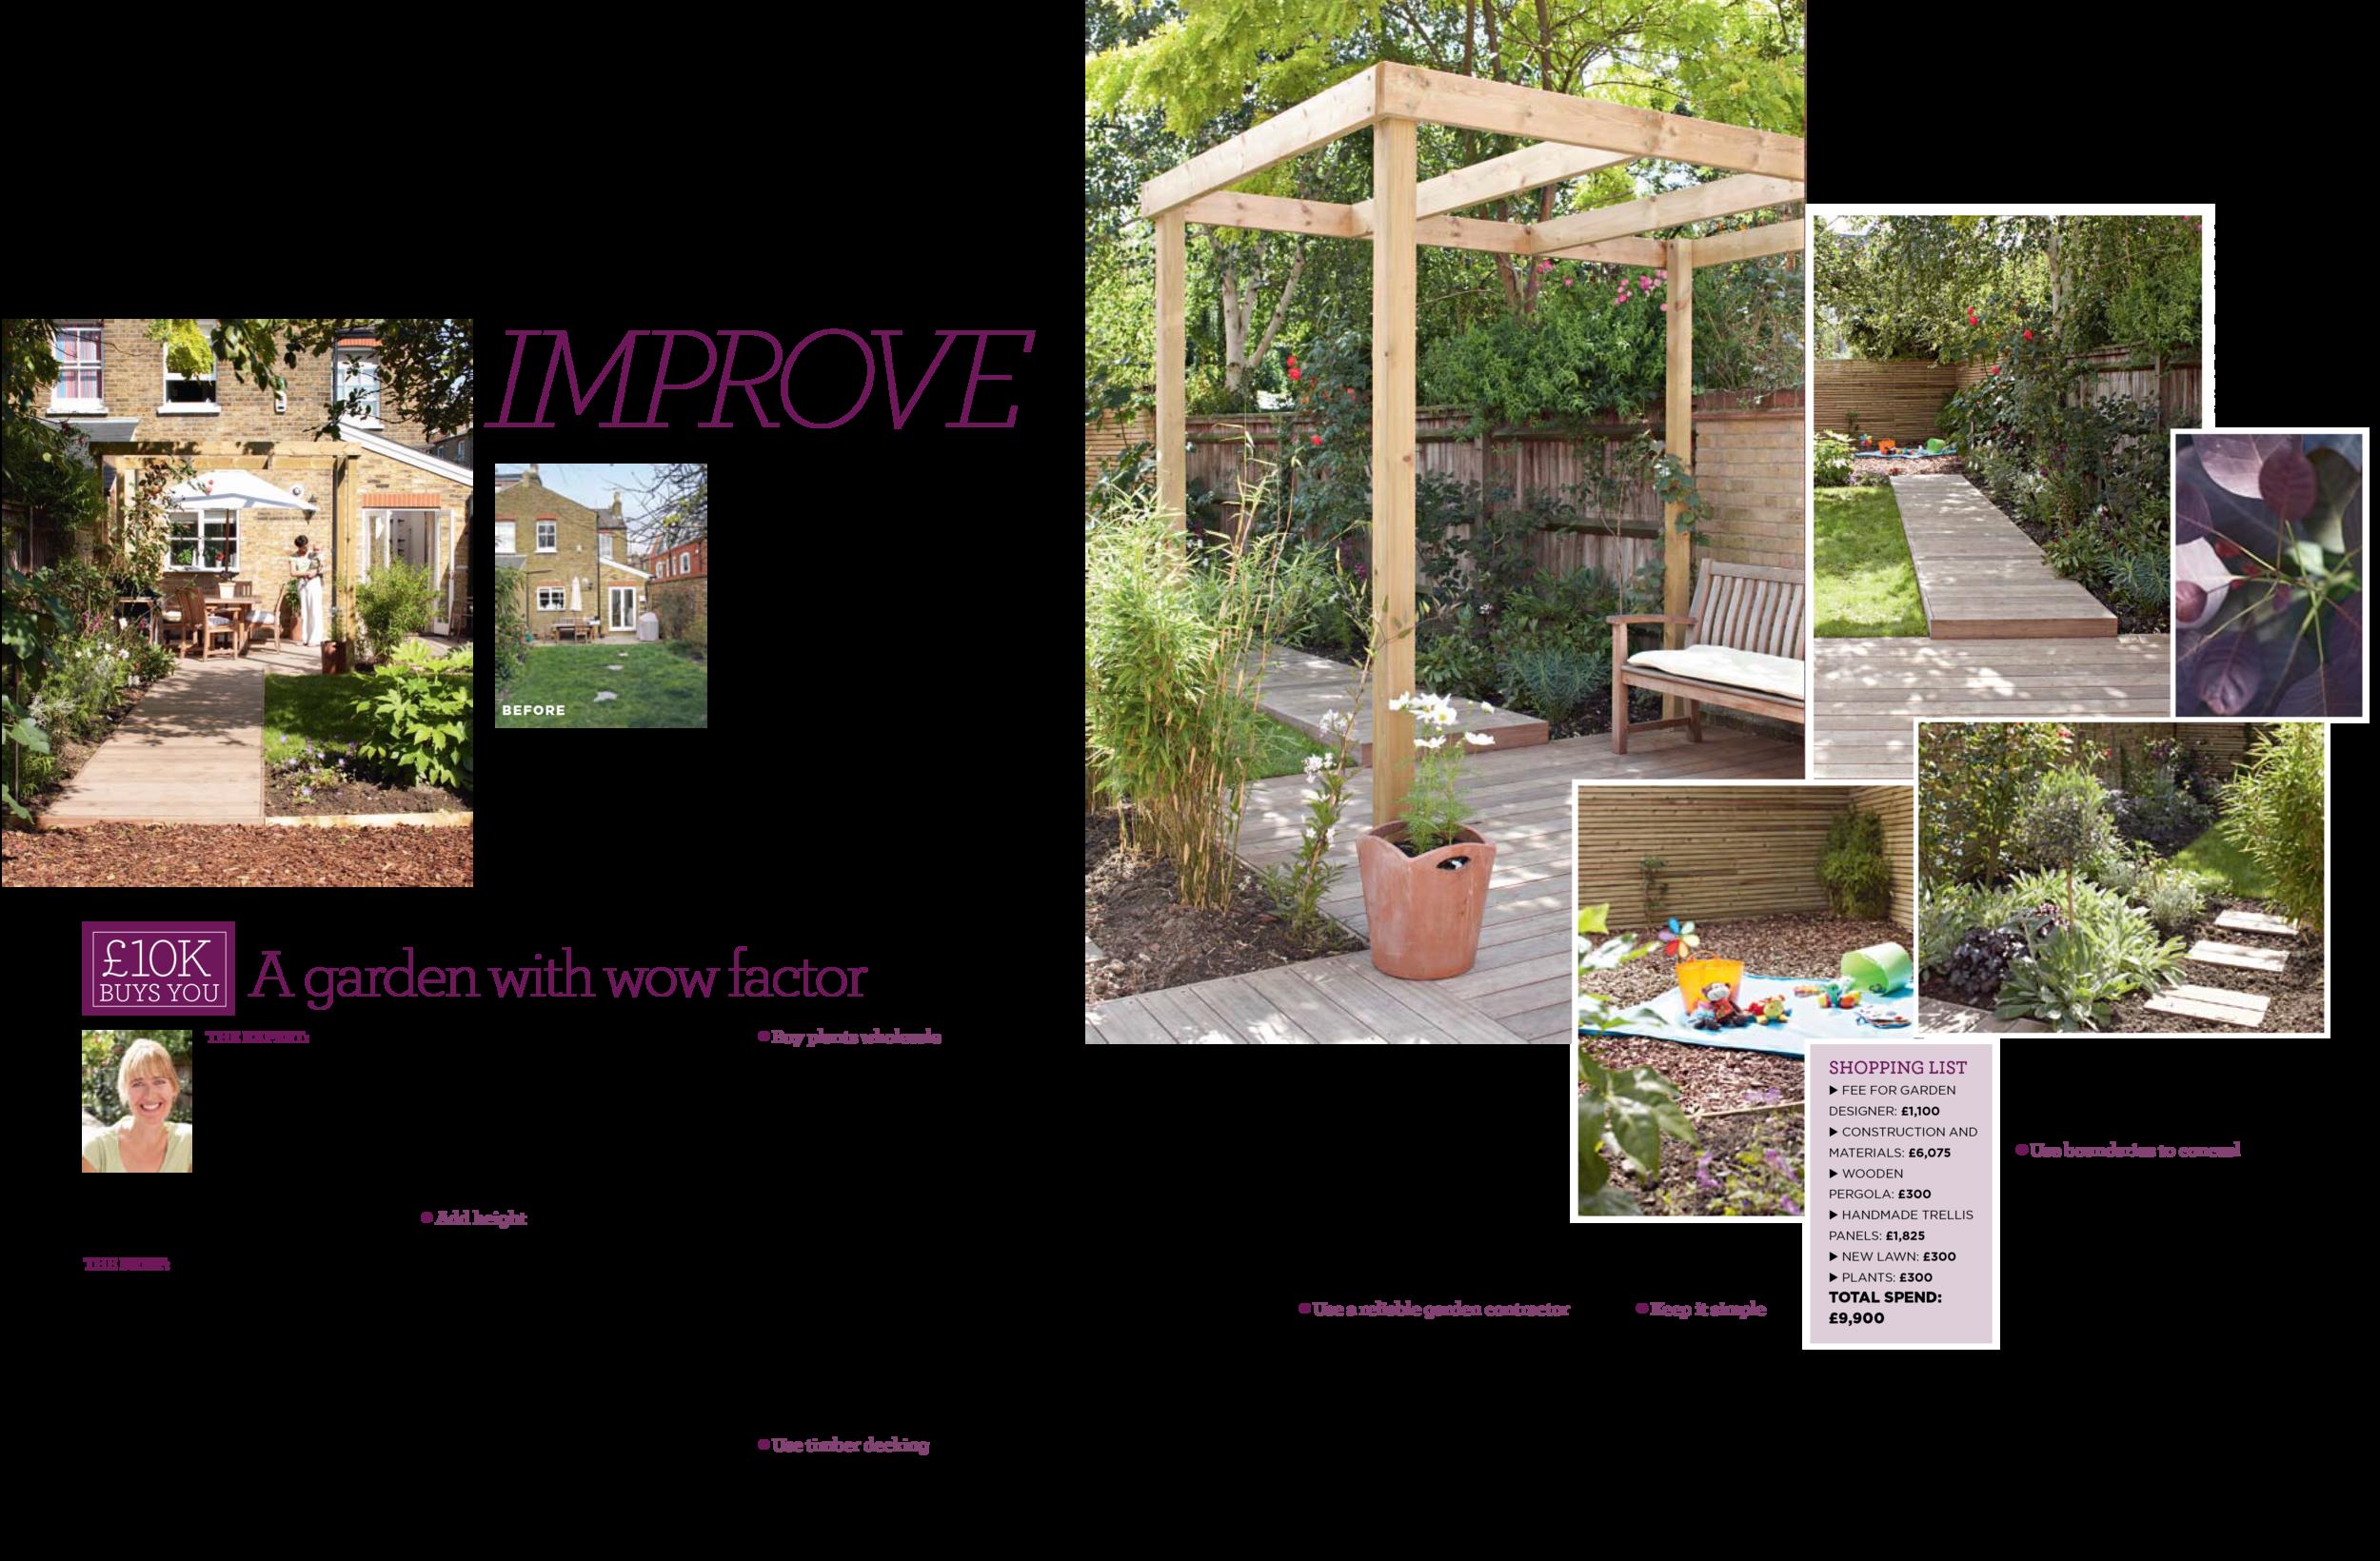 Red_Magazine_Nov08_Garden_Design.png